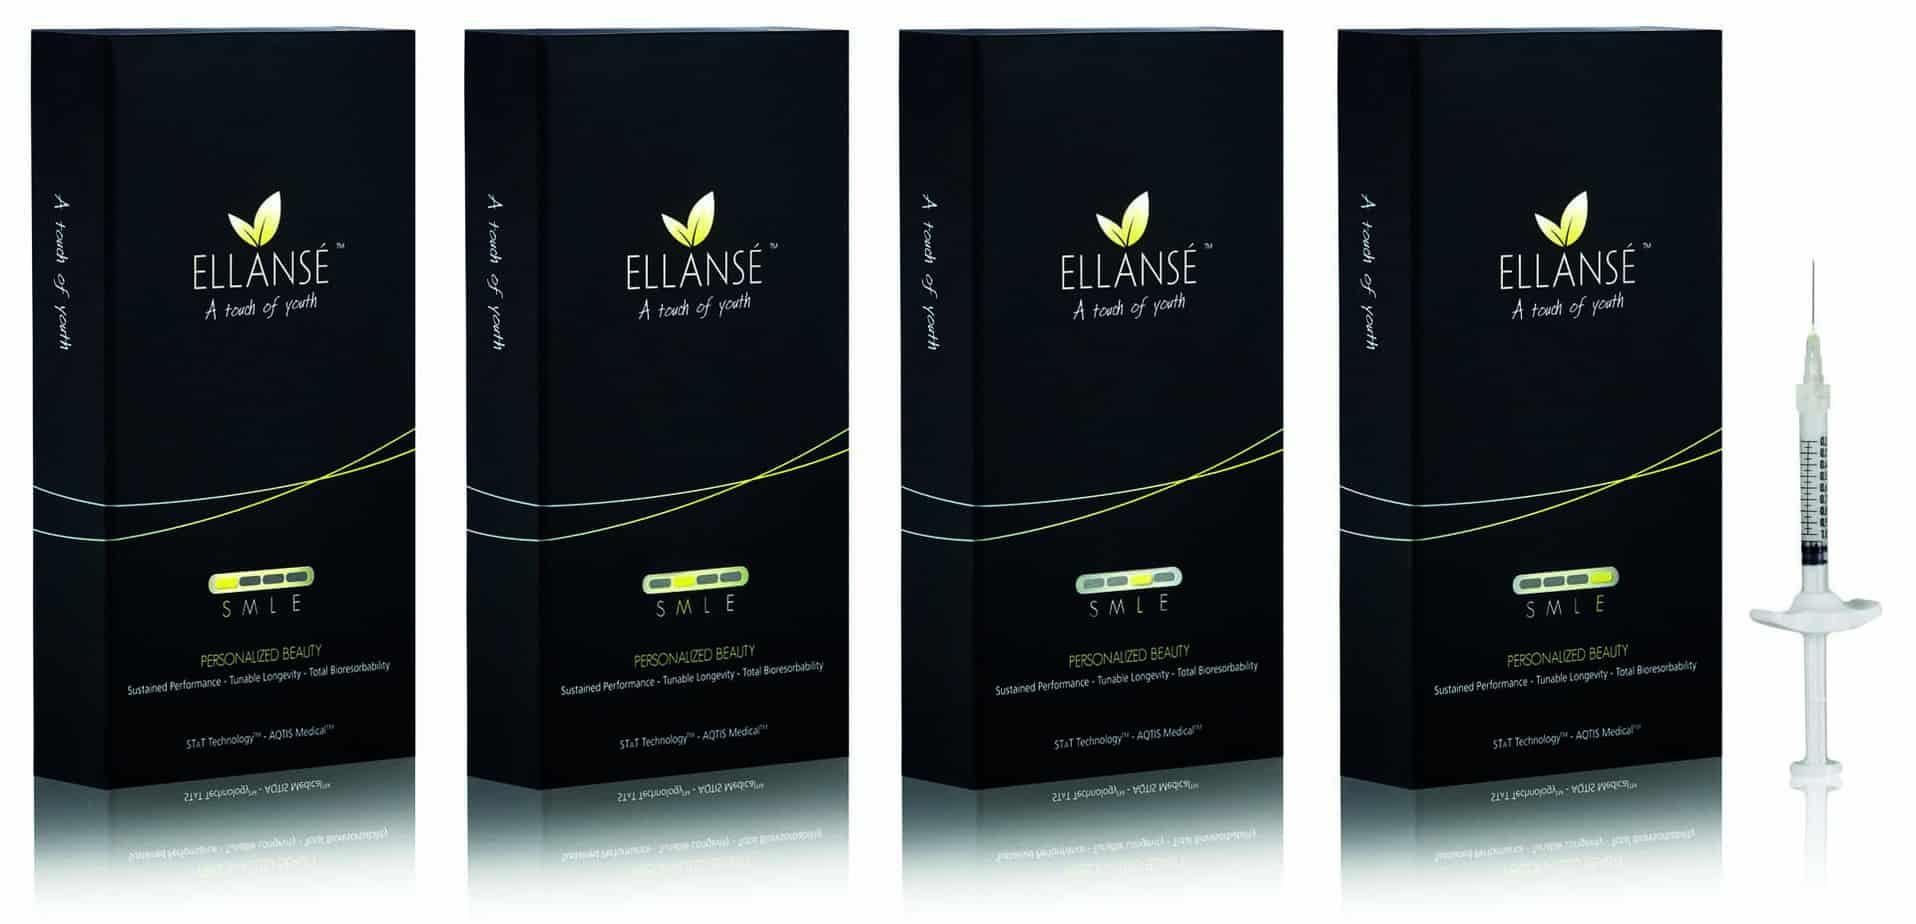 Ellanse-S-M-L-E_syringe-needle - צילום יחצ